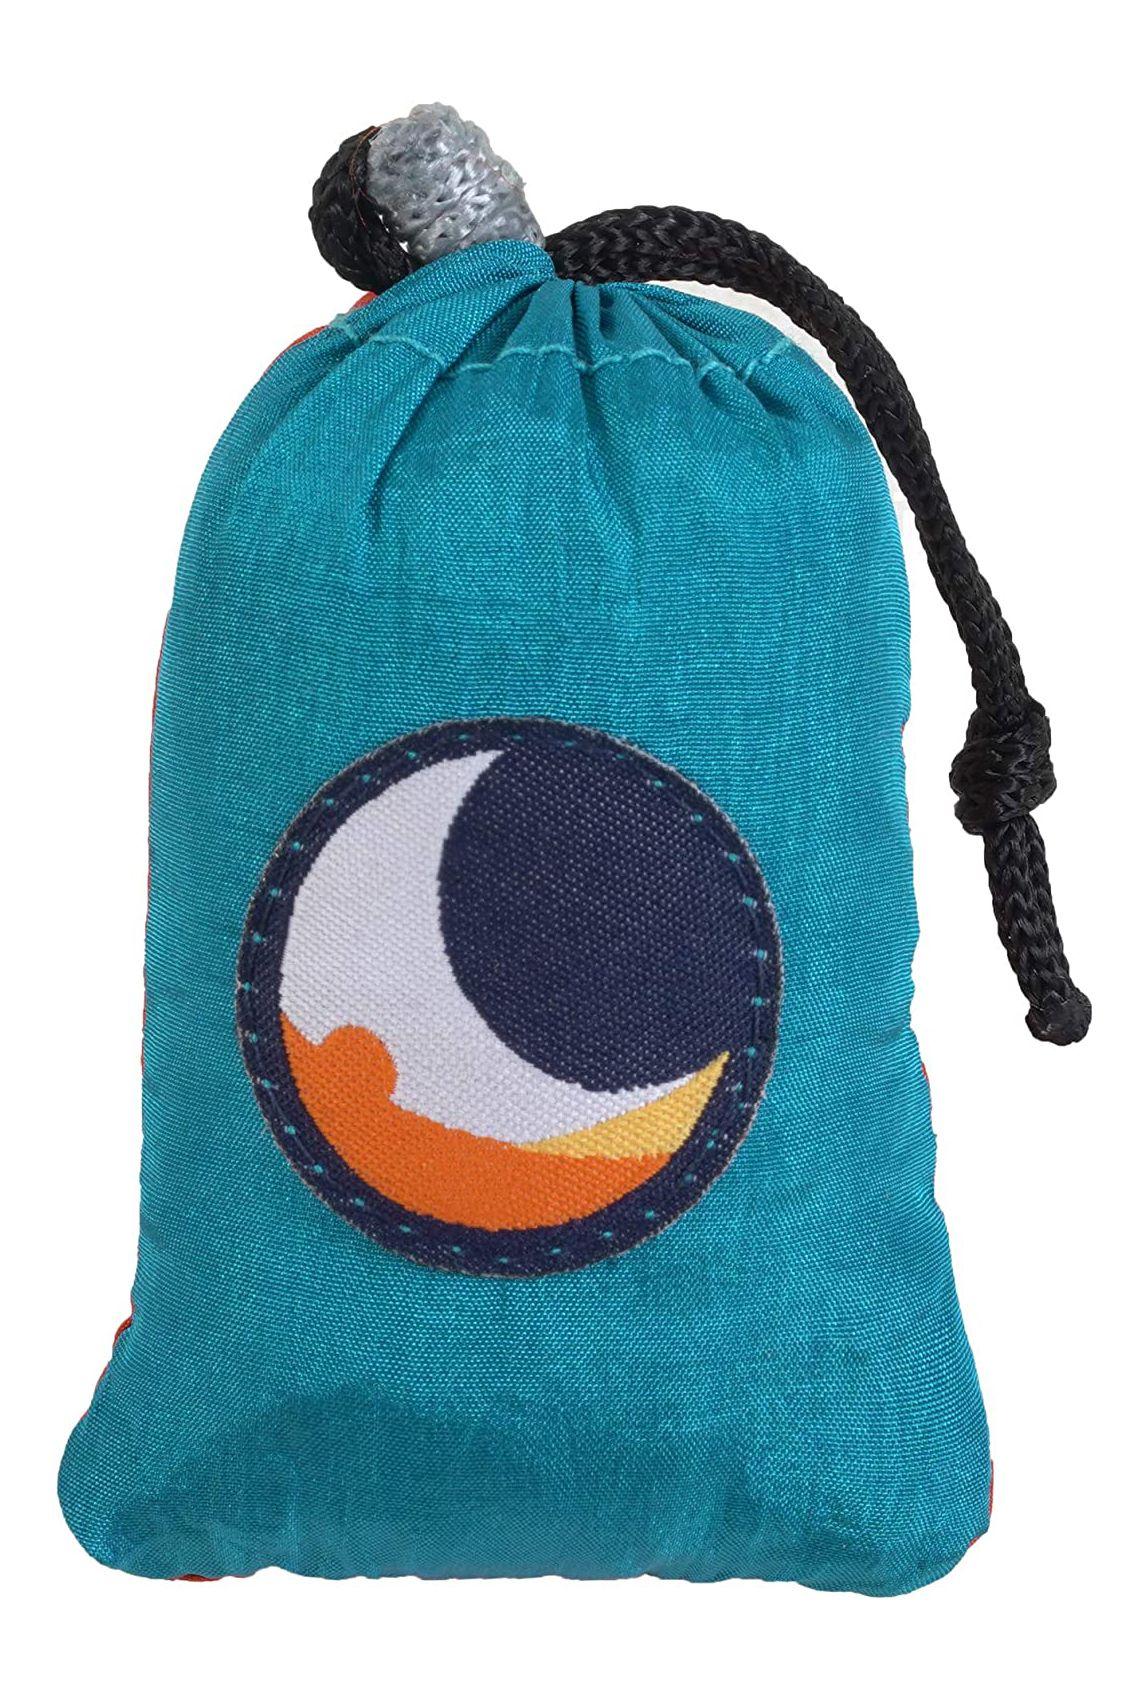 Ticket To The Moon Bag ECO BAG SMALL Aqua/Orange